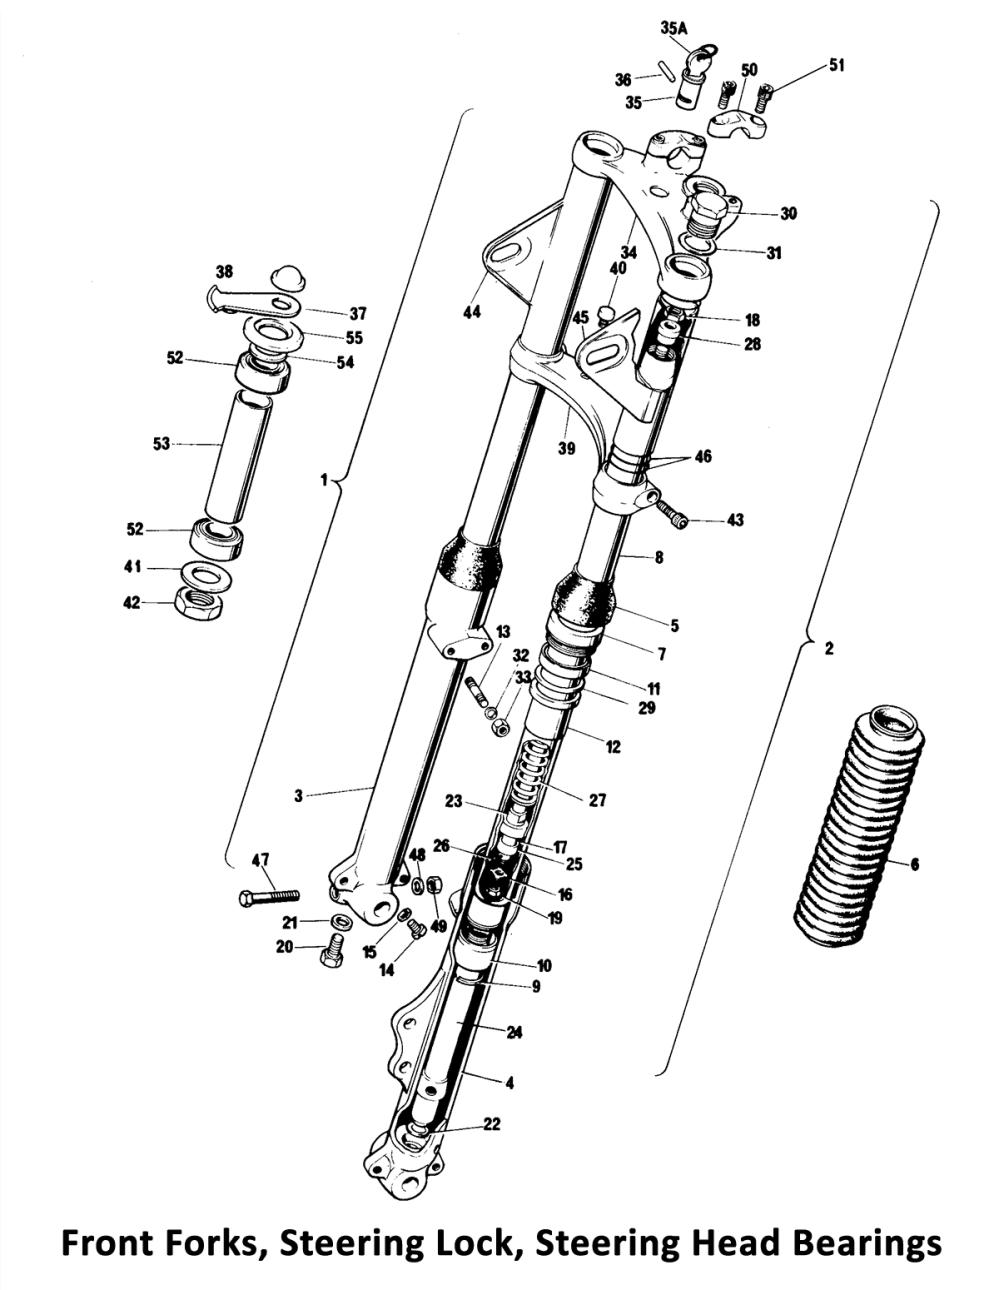 medium resolution of 1975 norton commando mk3 front forks steering head bearings wire diagram 1975